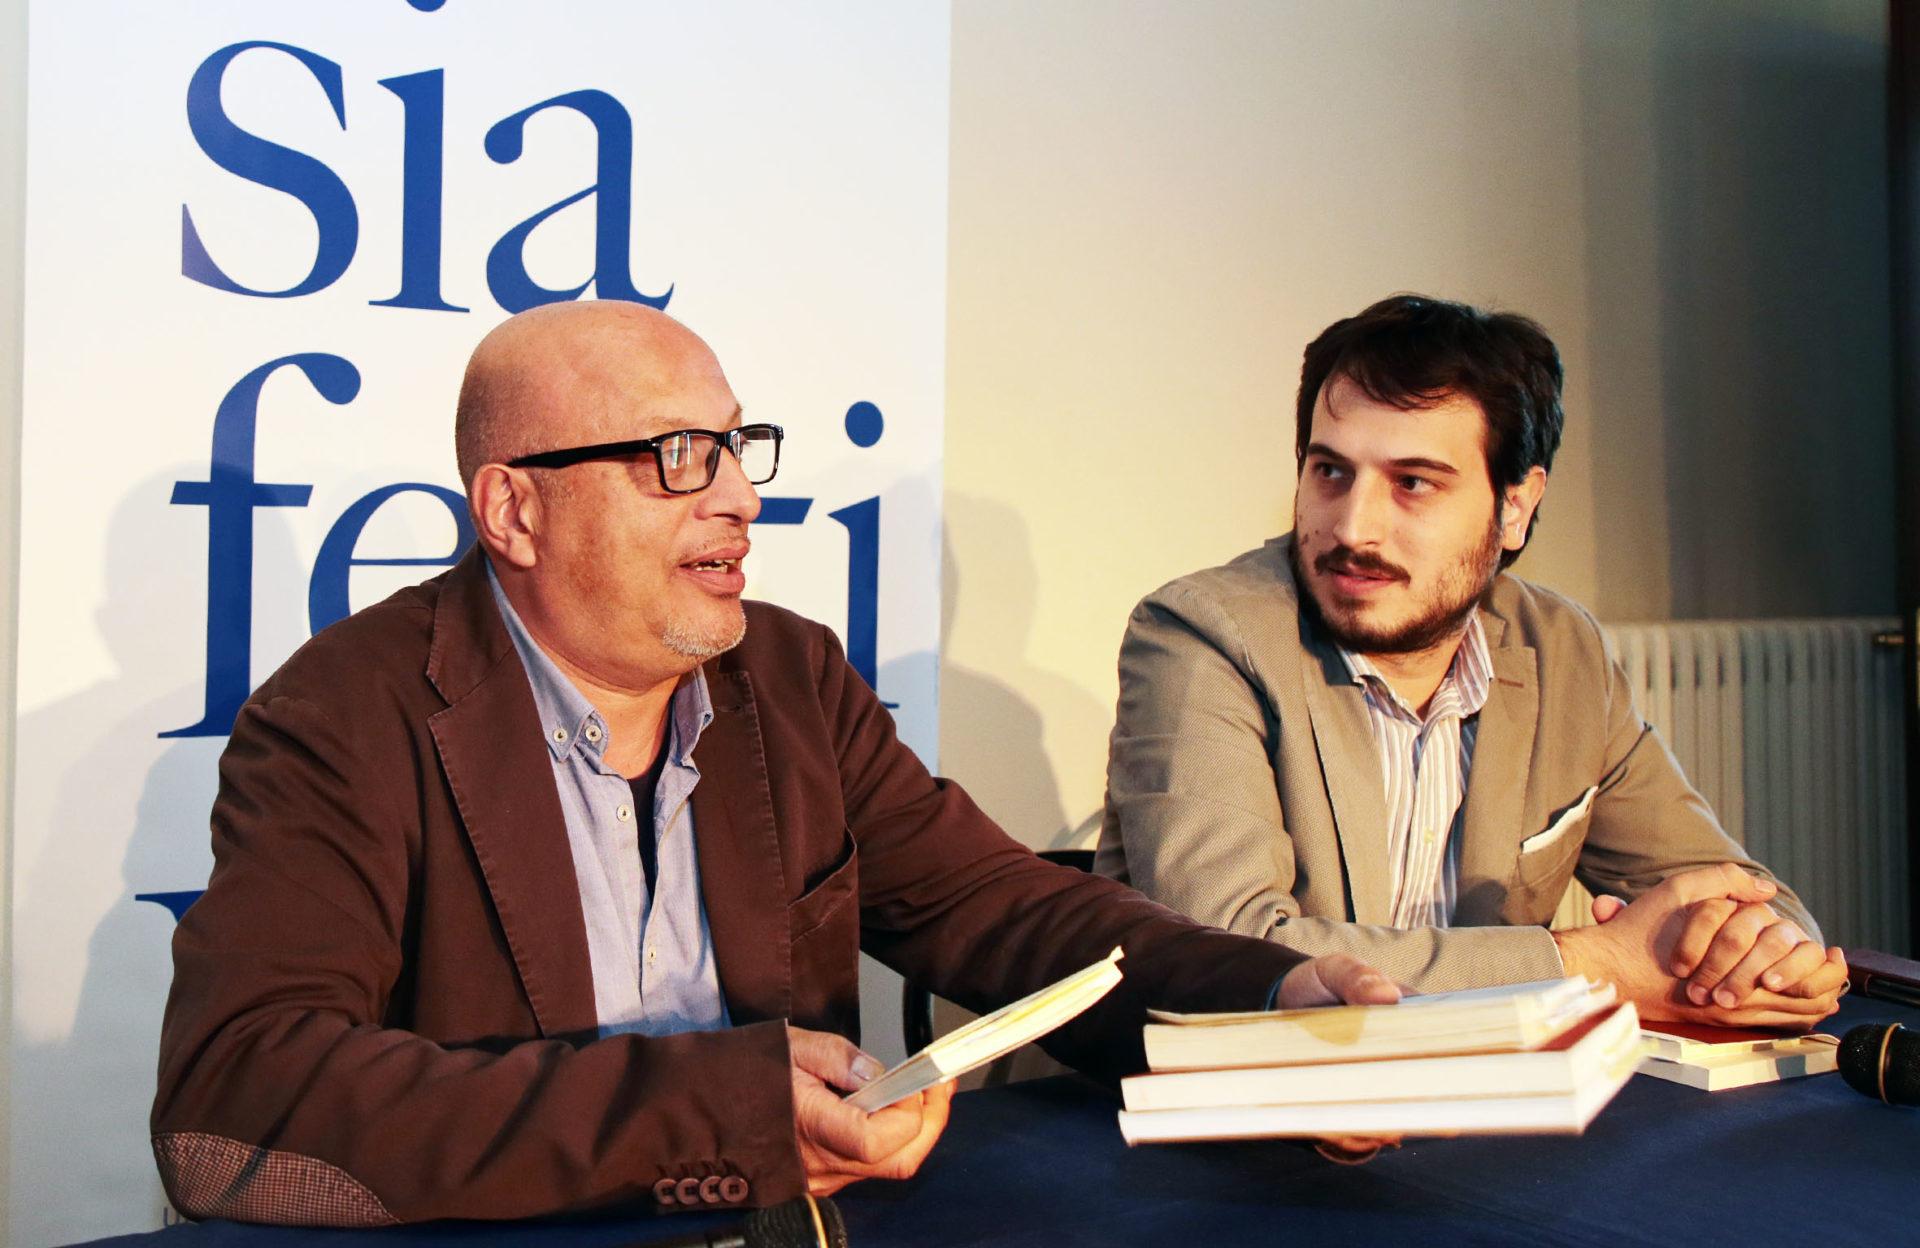 Fabio Franzin e Marco Bini a Poesia Festival '17 - photo © Elisabetta Baracchi